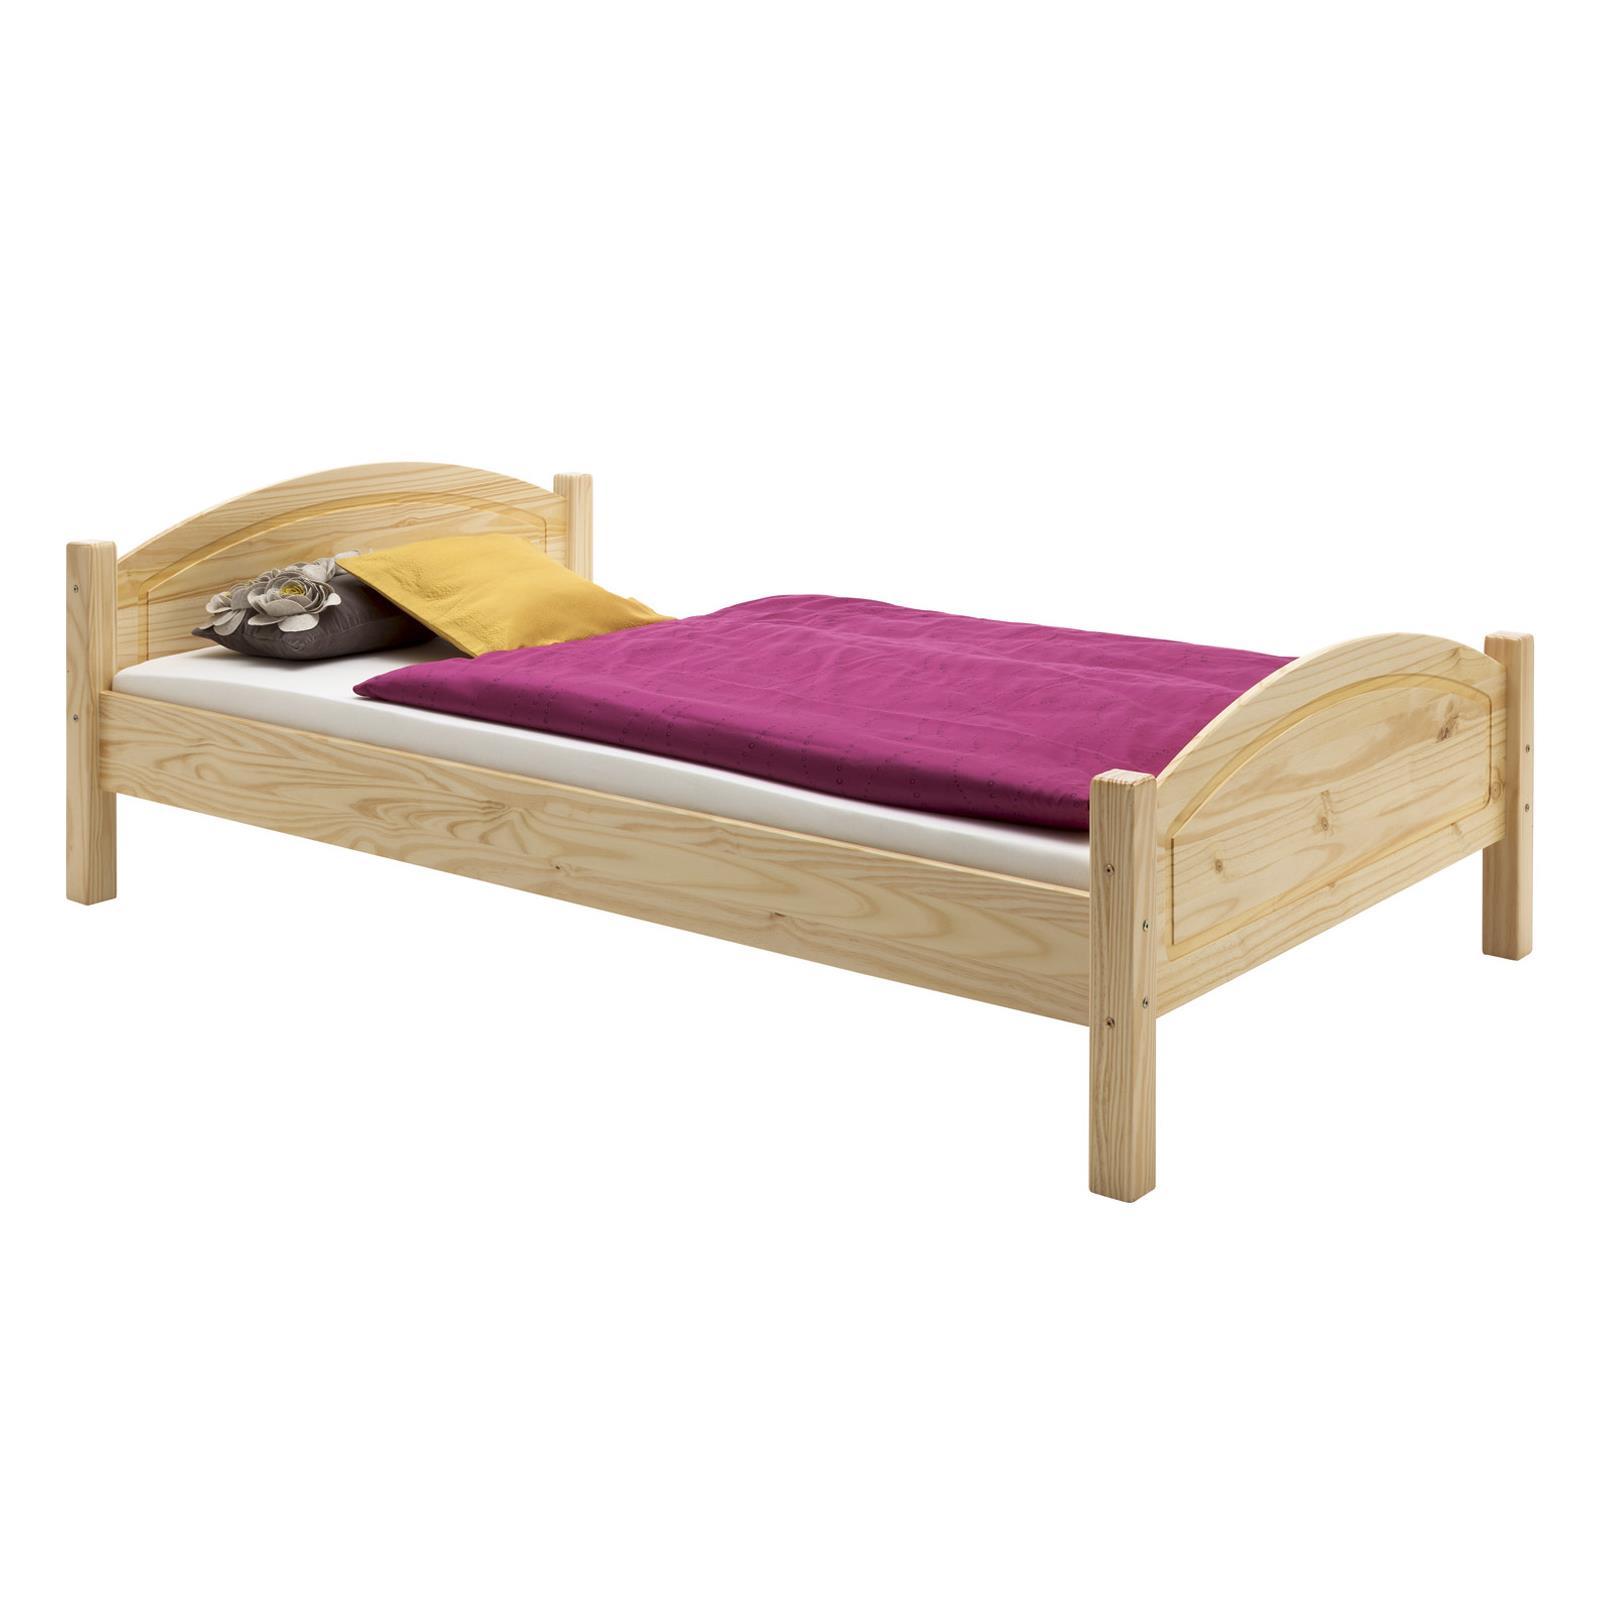 holzbett flims in natur 120 x 200 cm mobilia24. Black Bedroom Furniture Sets. Home Design Ideas